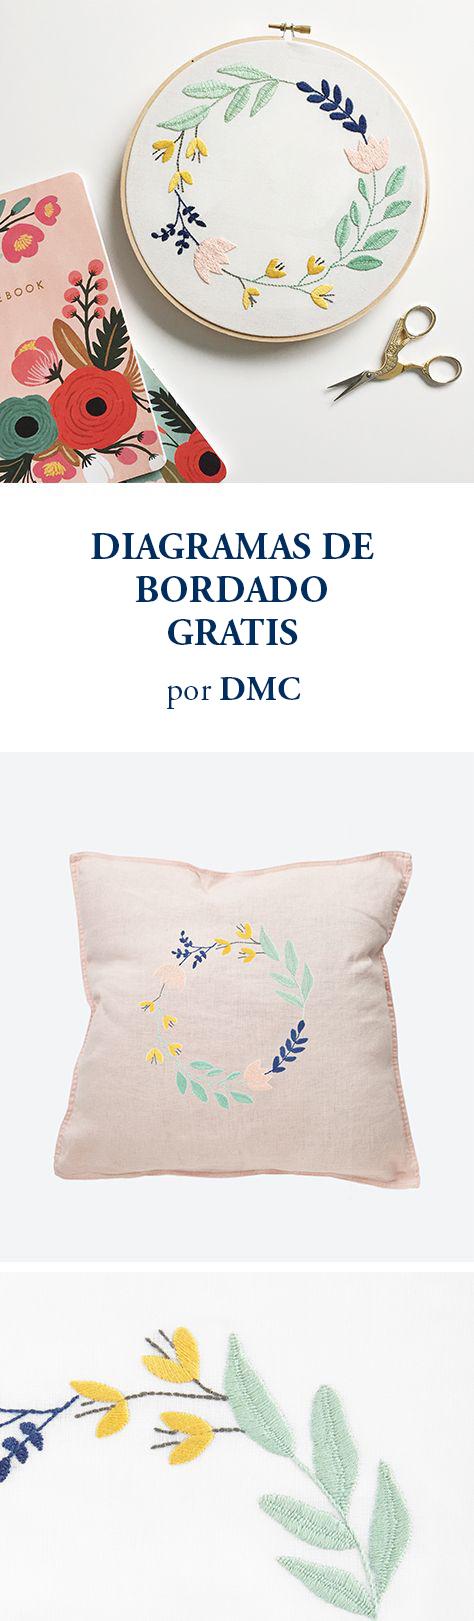 DIAGRAMAS DE BORDADO GRATIS POR DMC | FREE PATTERNS